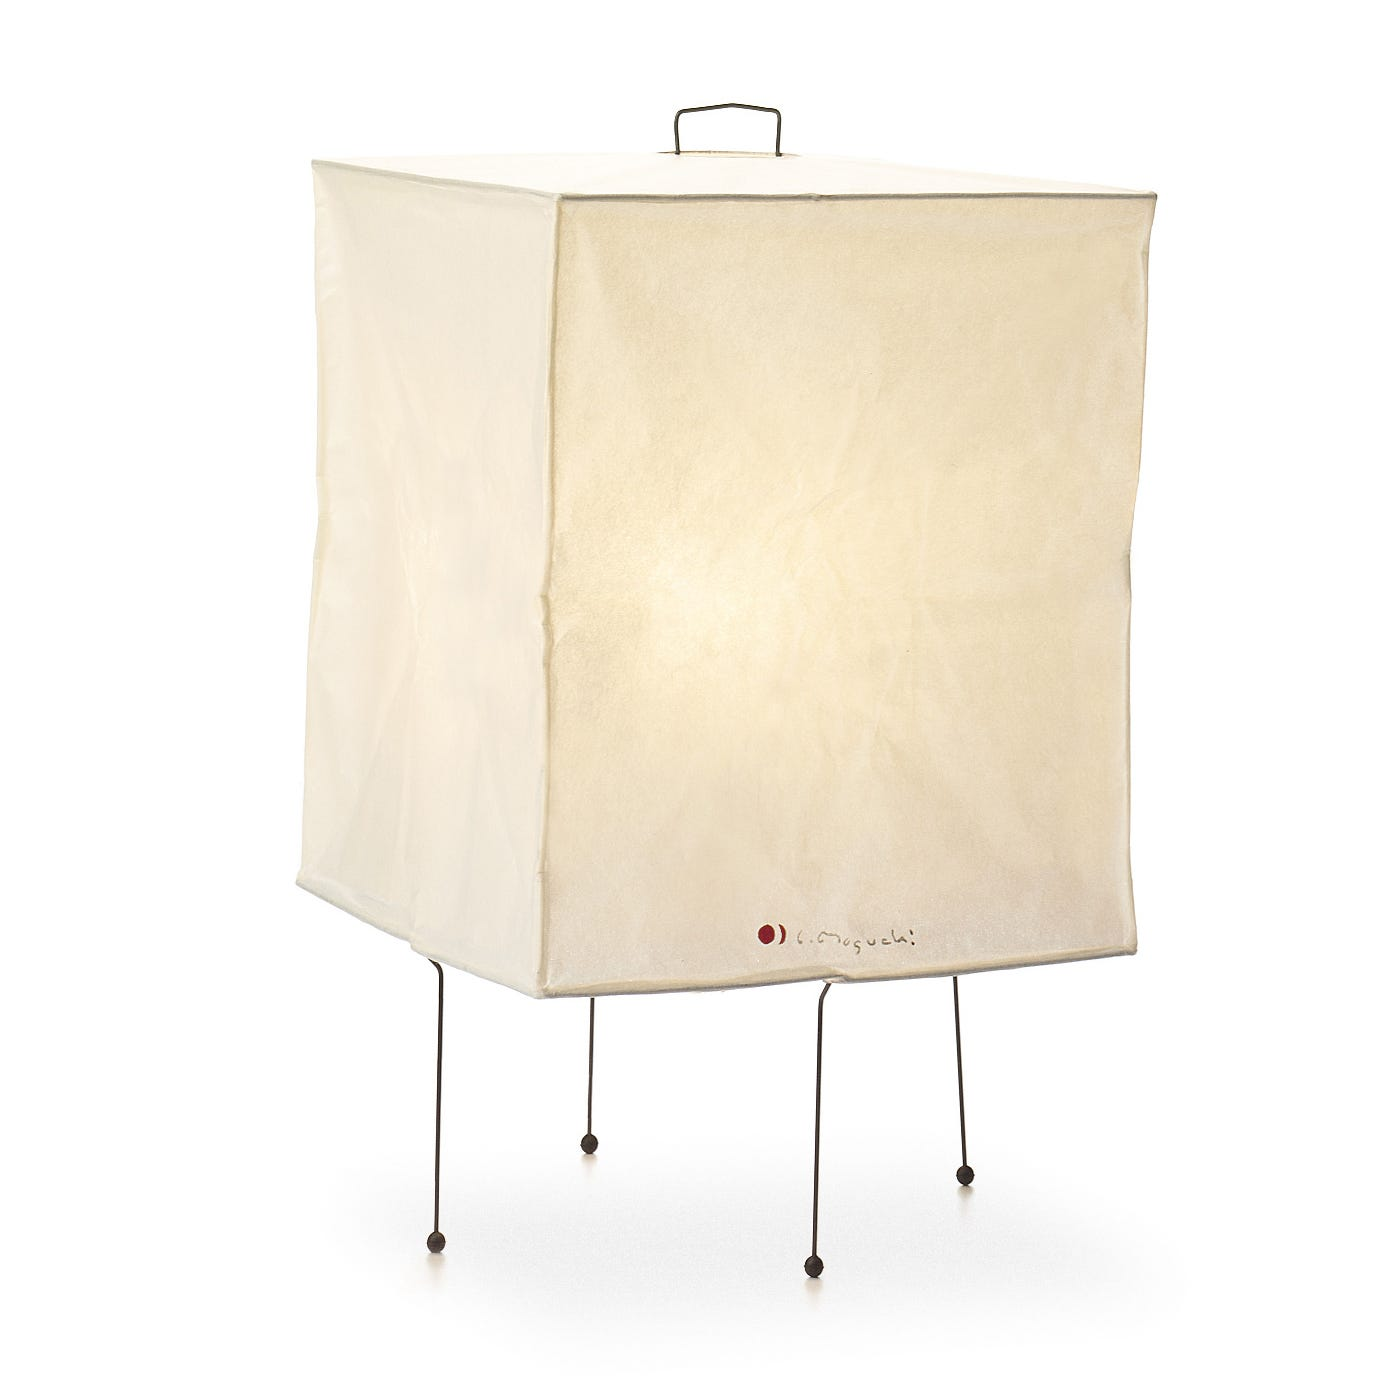 Akari XP1 Table Lamp